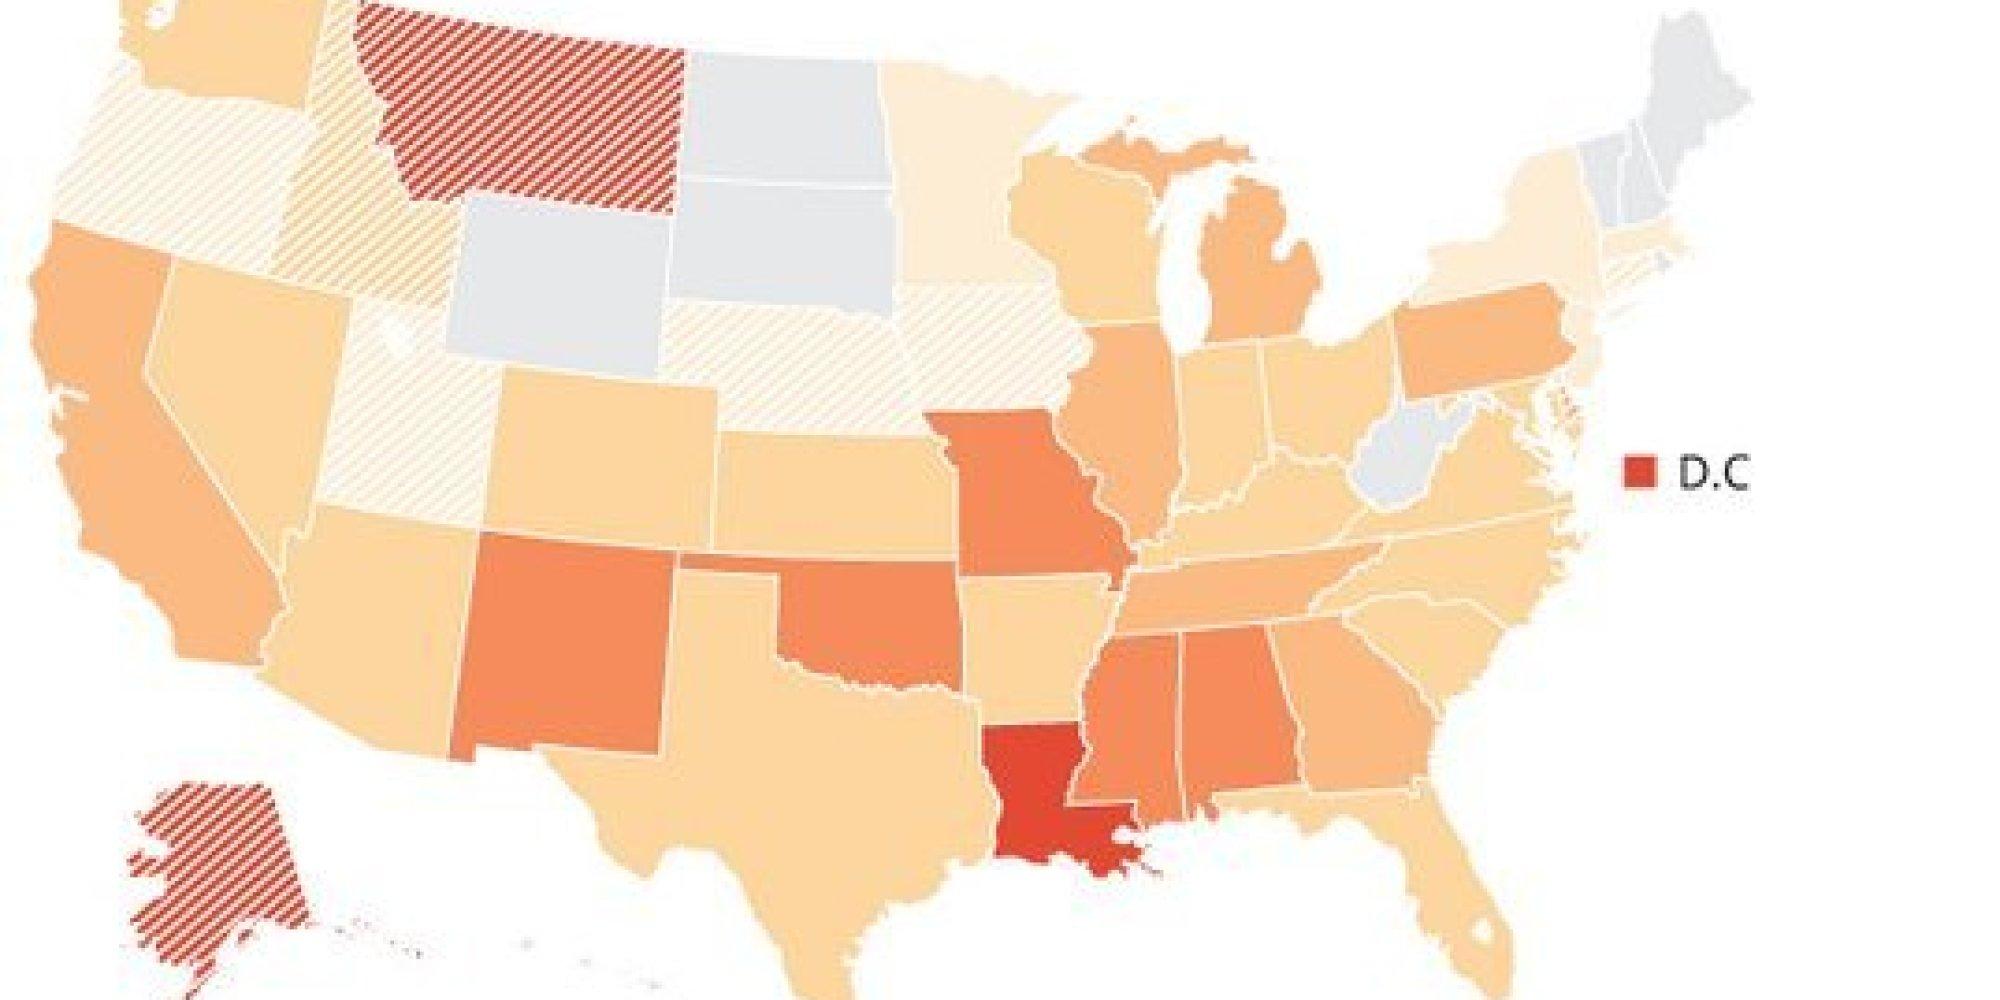 The Horrific Risk Of Gun Violence For Black Kids In America In 4 Charts Huffpost